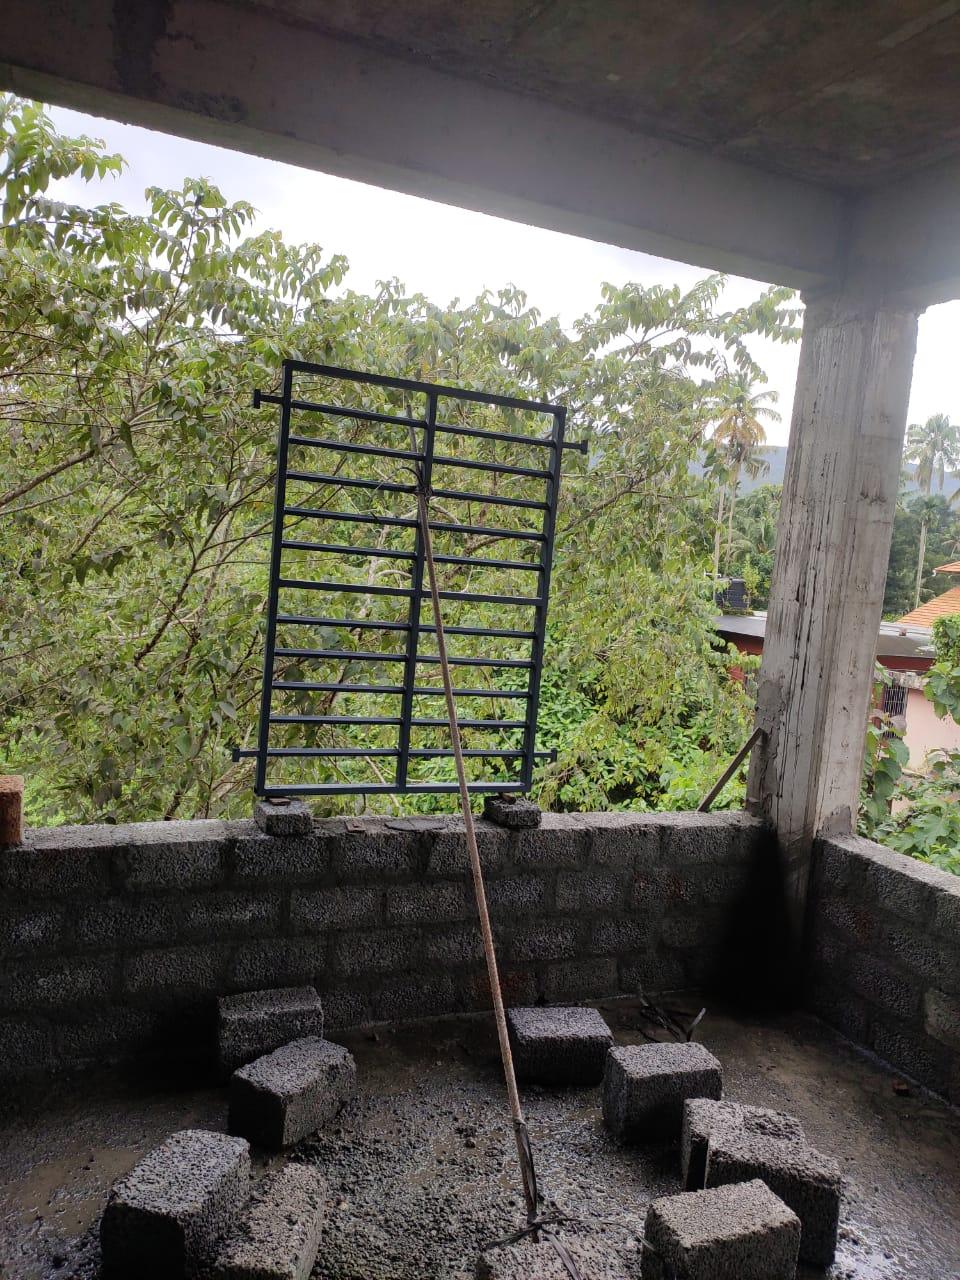 Residential - Work in Progress